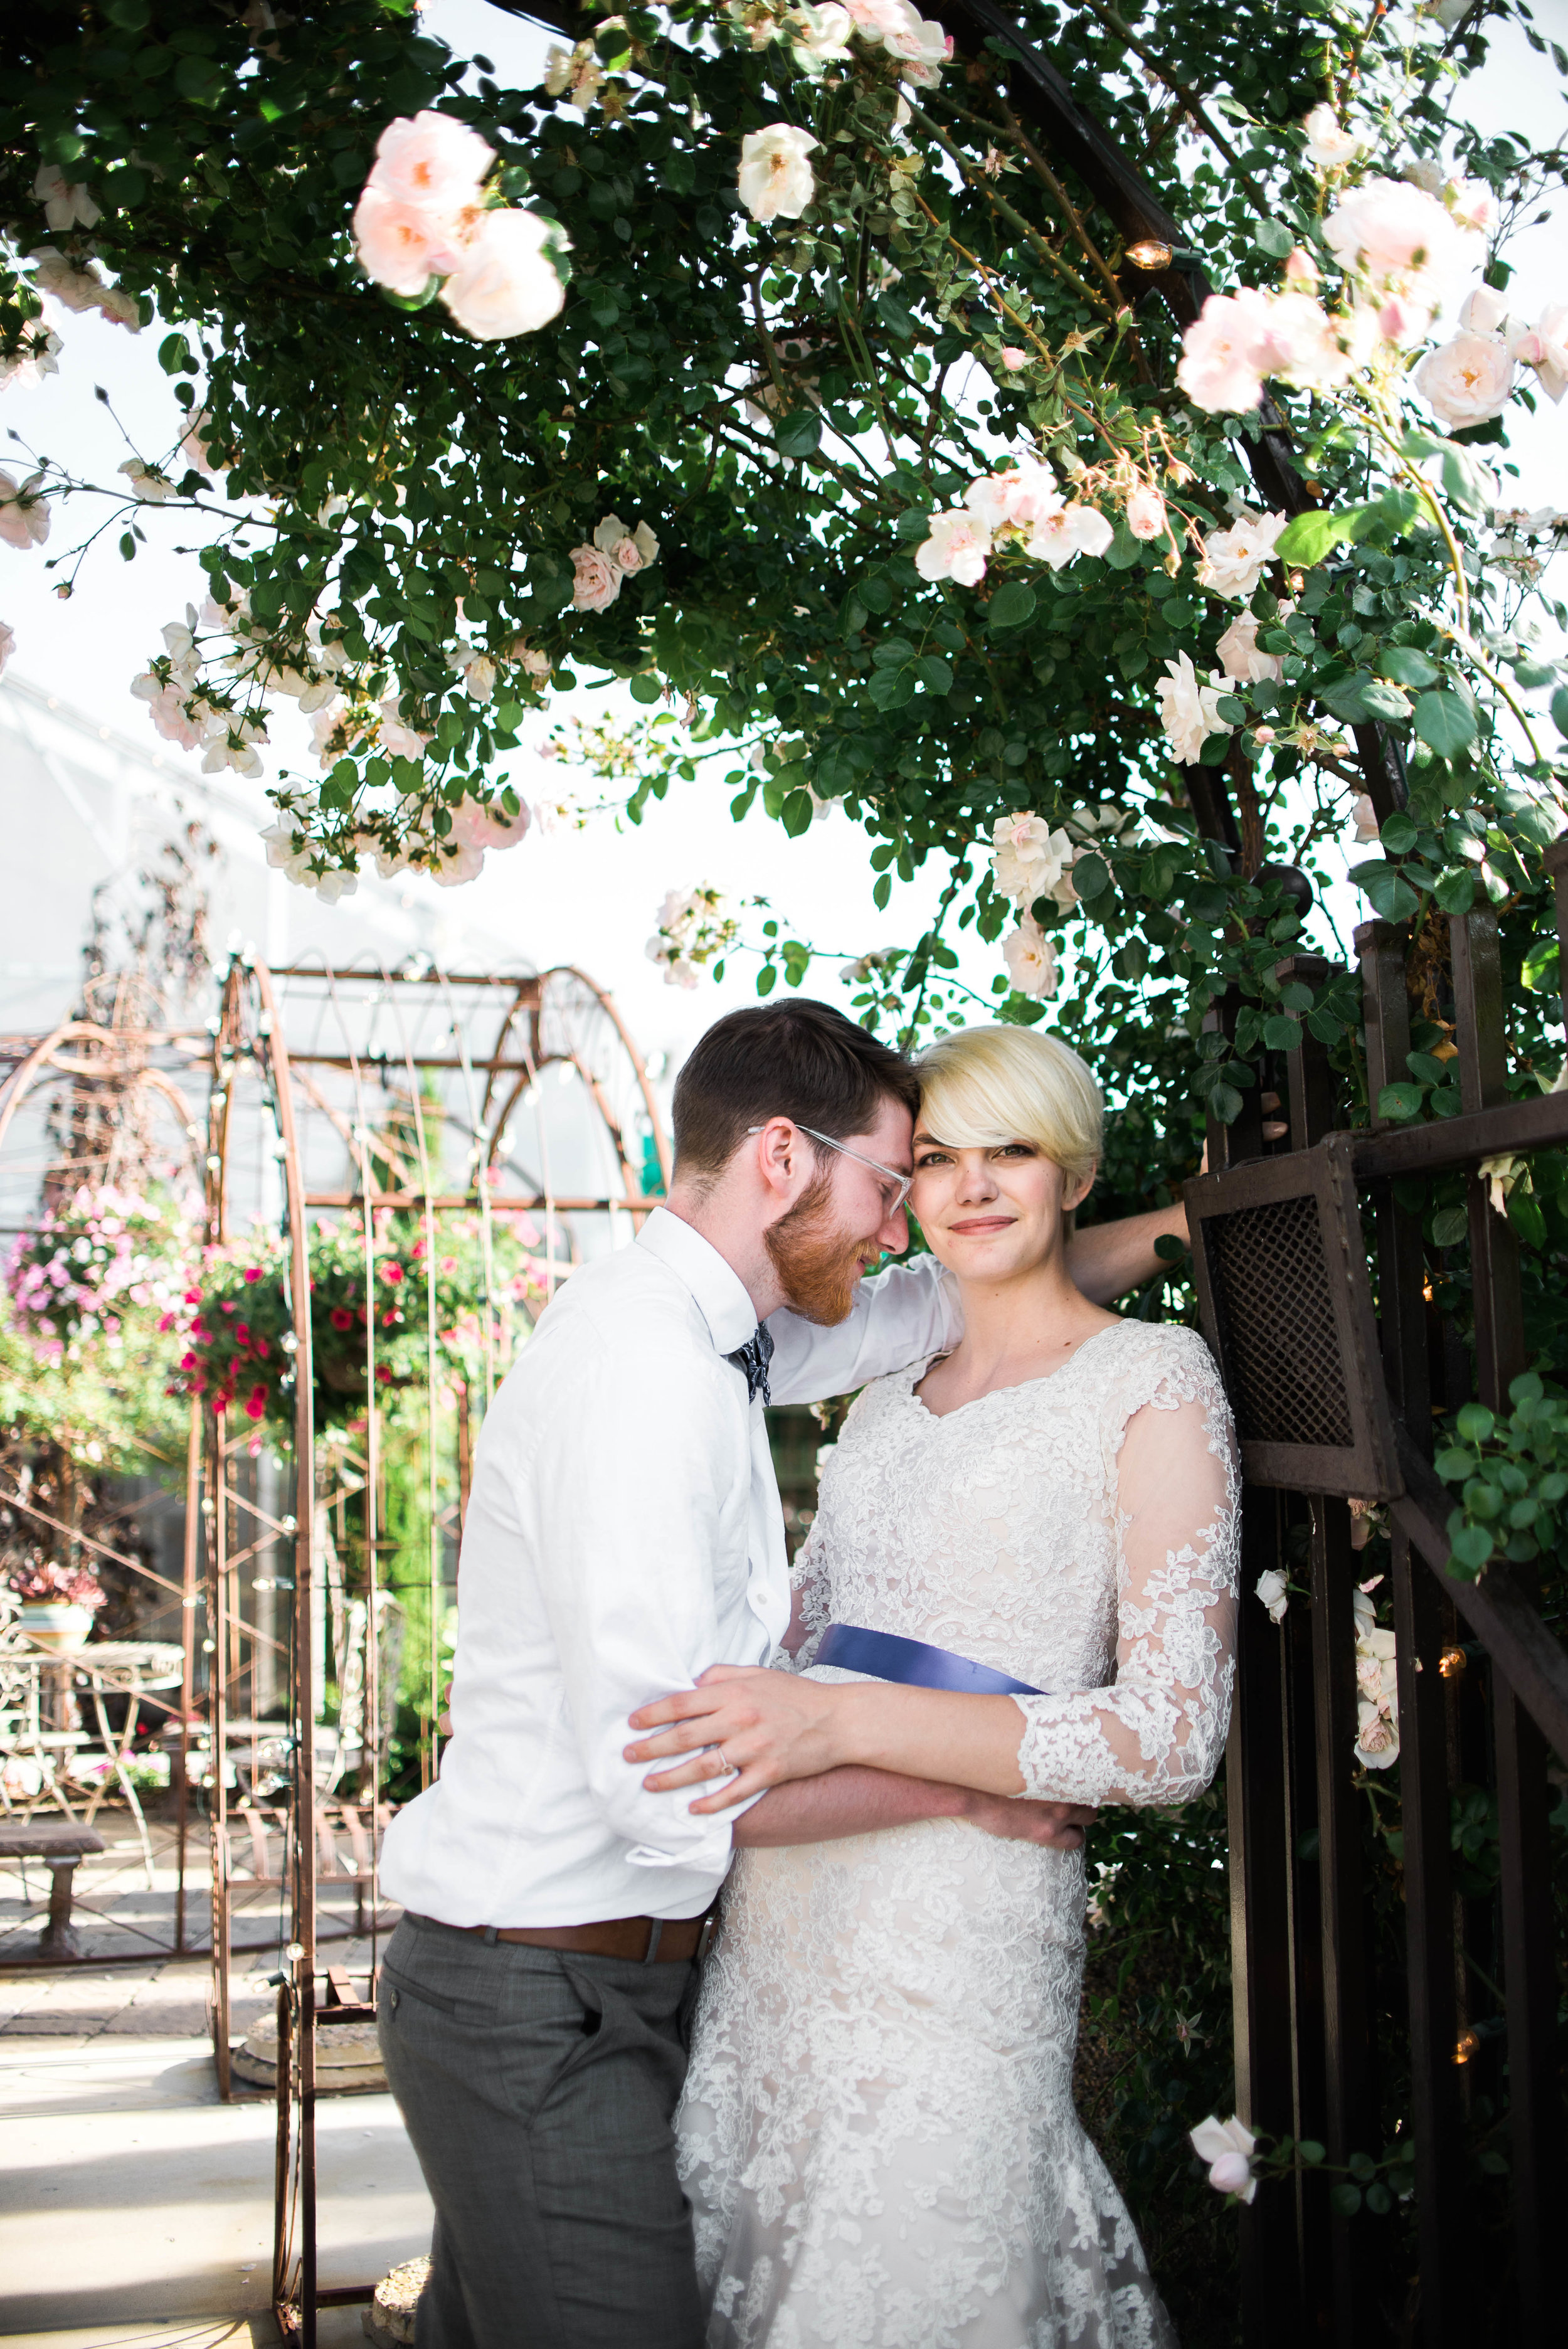 K+M-Wedding-DaySadie_Banks_Photography-920.jpg